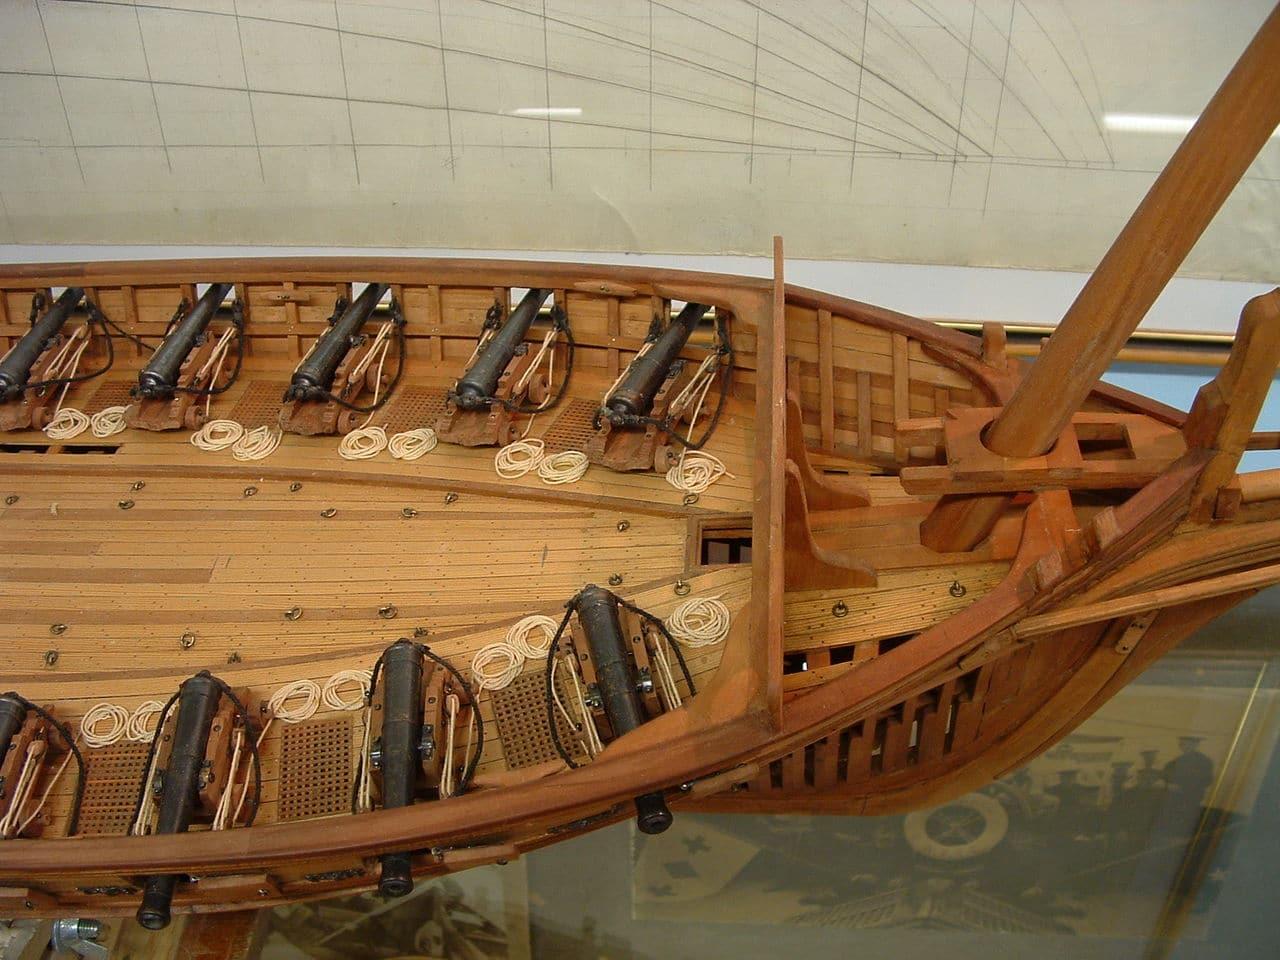 Chebec Le Requin - 1750 1212